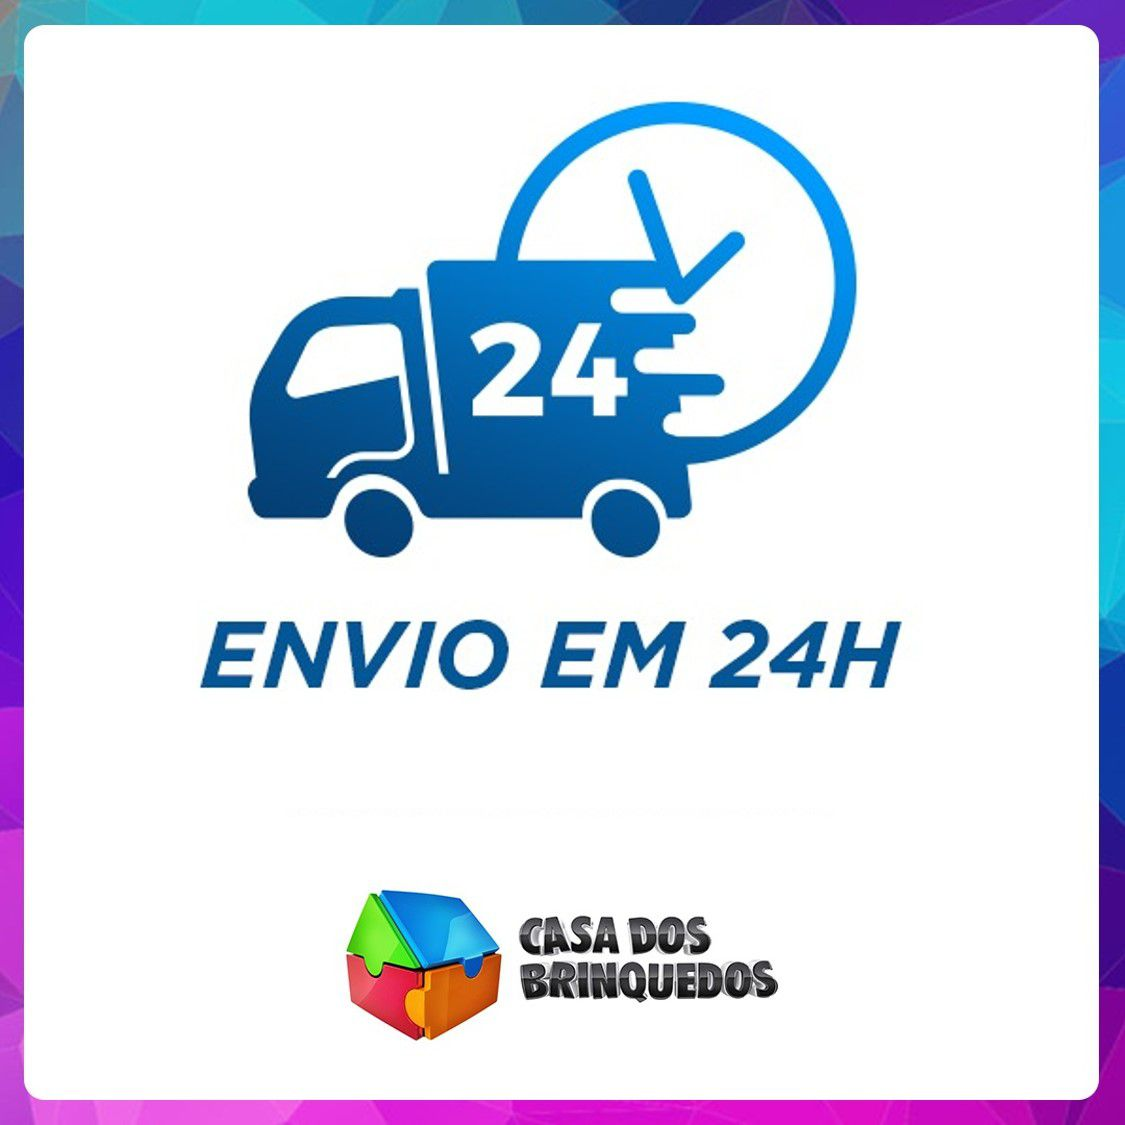 BONECO DE VINIL MINIONS MEU MALVADO FAVORITO STUART 2788 LIDER